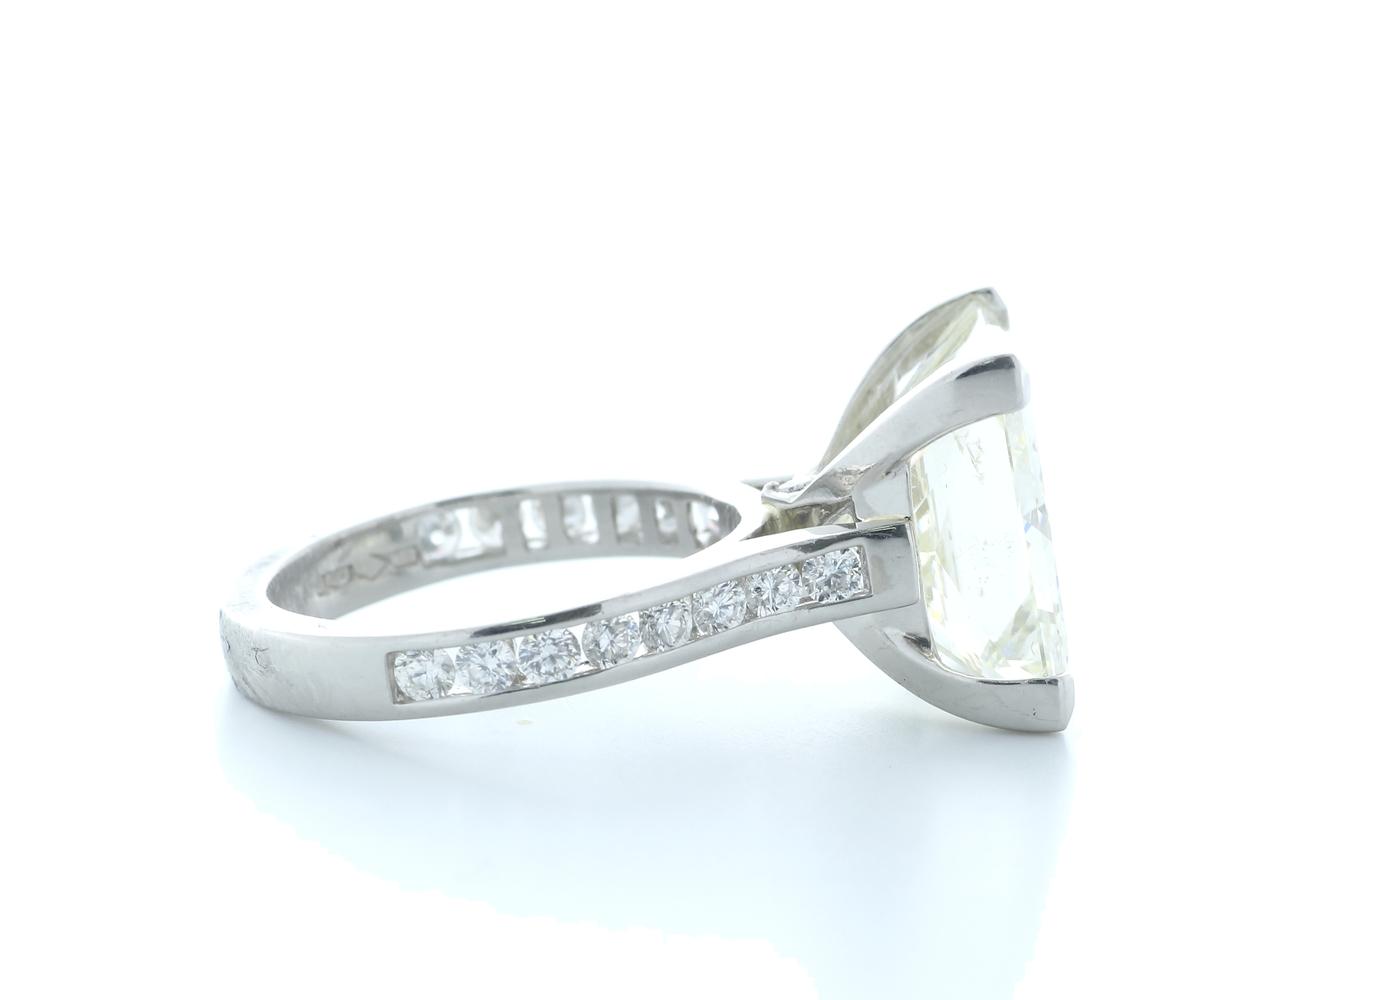 18ct White Gold Princess Cut Diamond Ring 10.00 Carats - Image 4 of 5